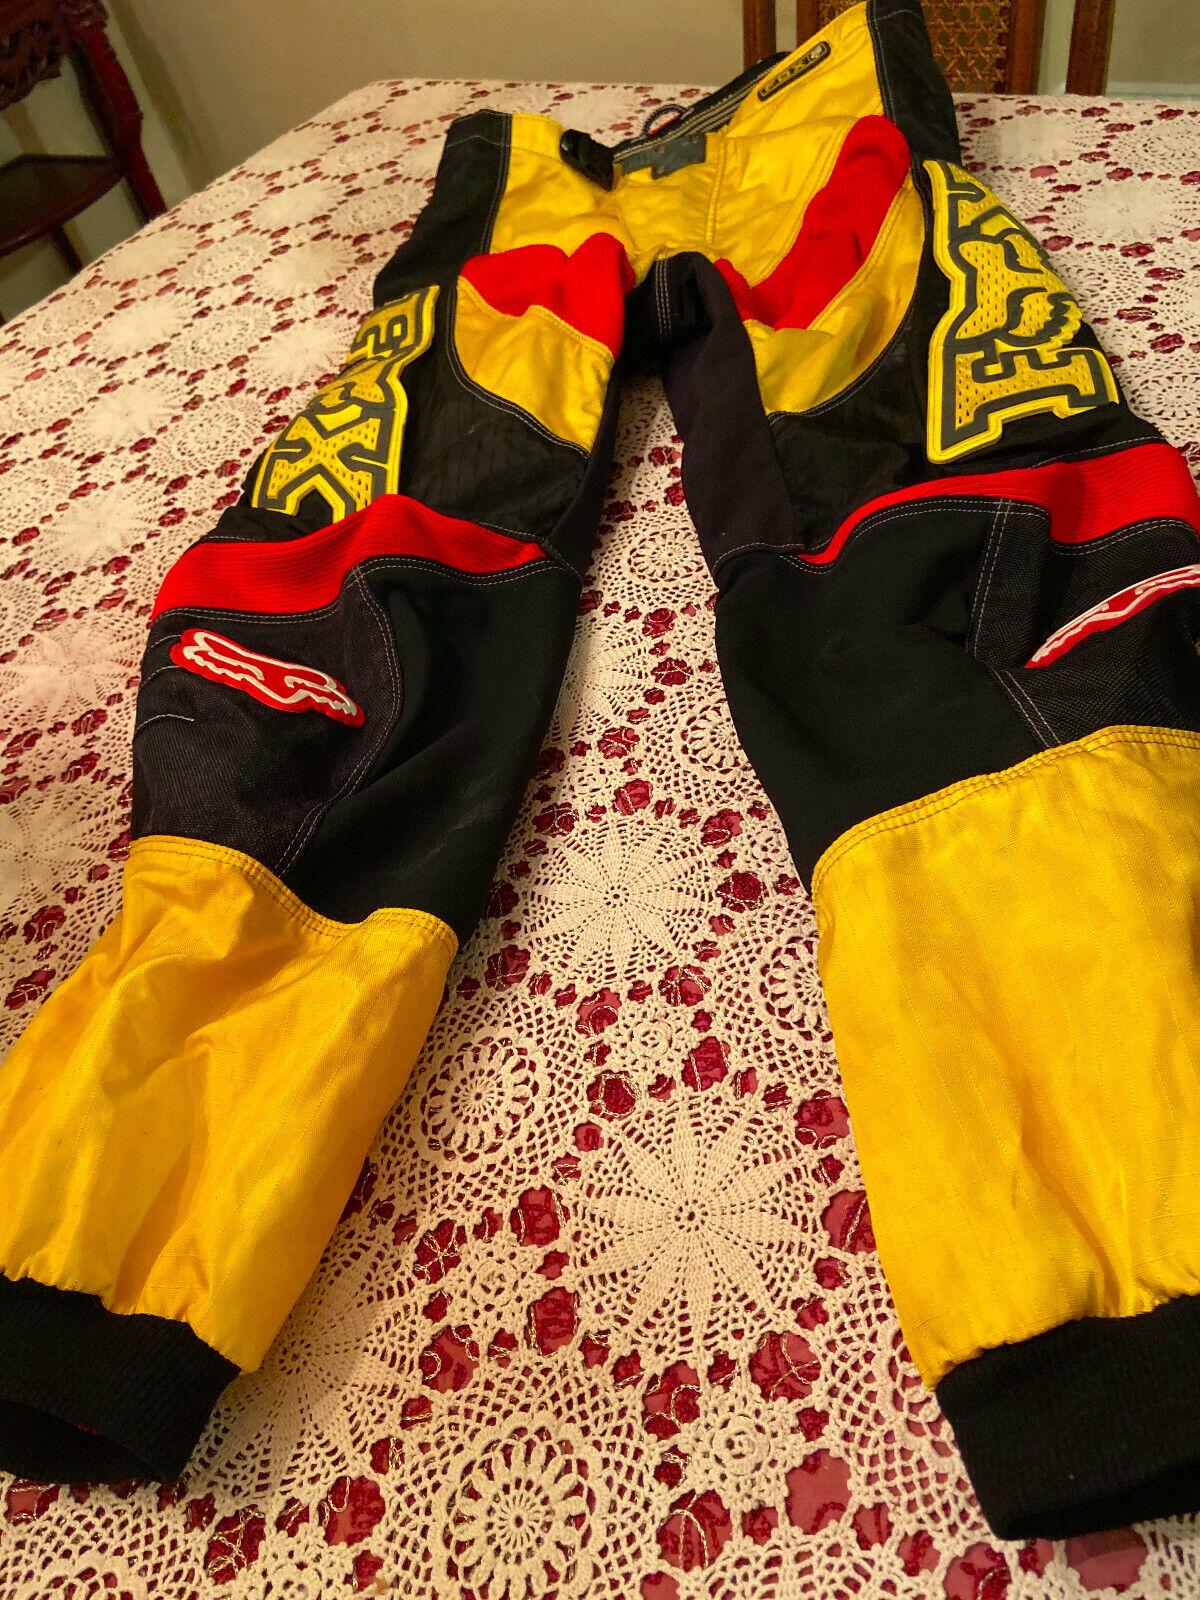 Fox 360 Race Pants Waterproof Motocross Motorcycle BMX Dirt Bike Racing Size 32